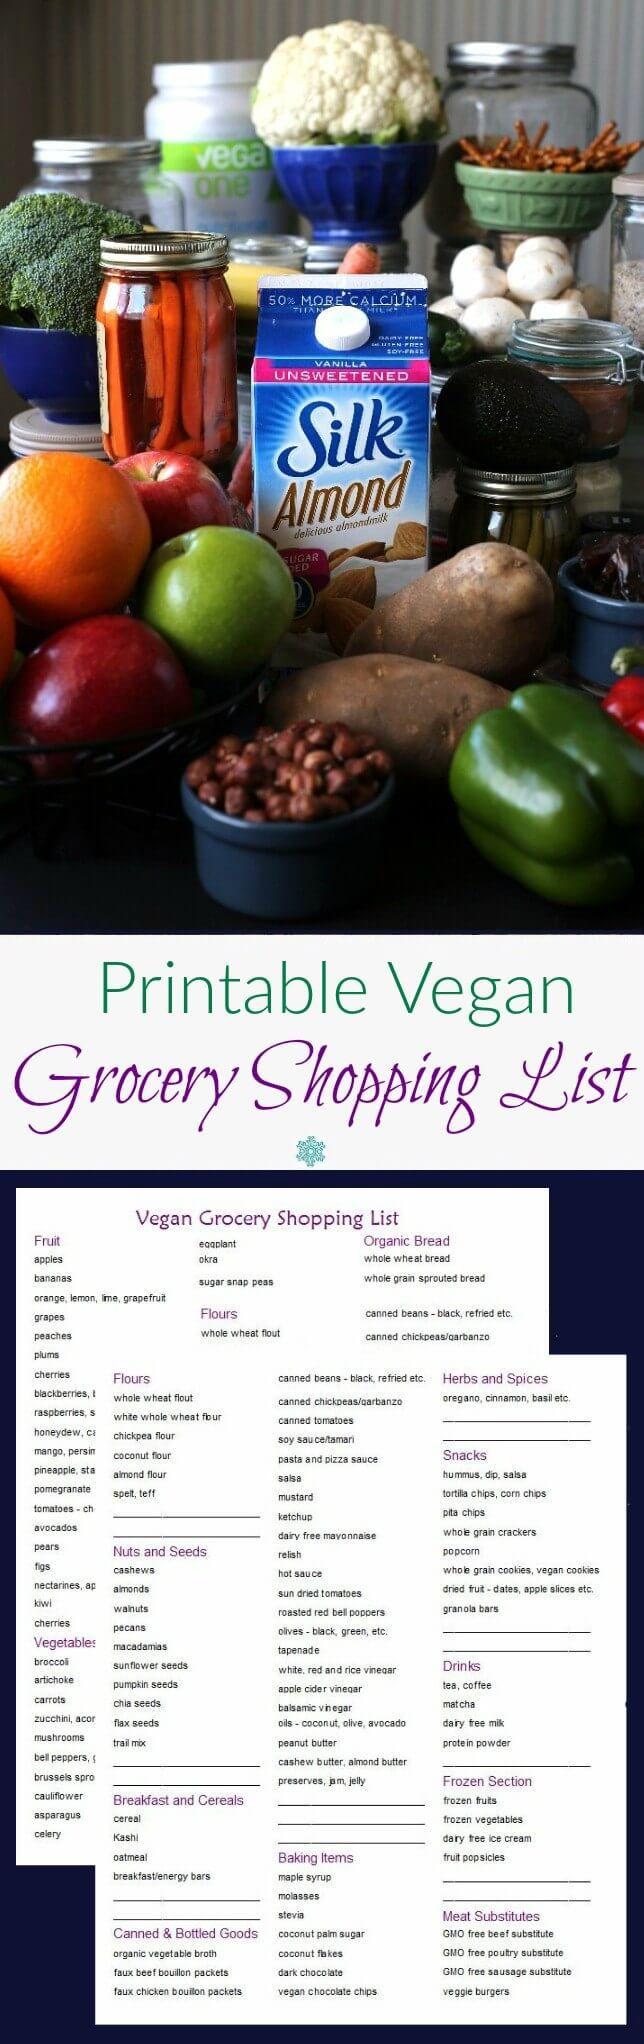 heart healthy shopping list pdf